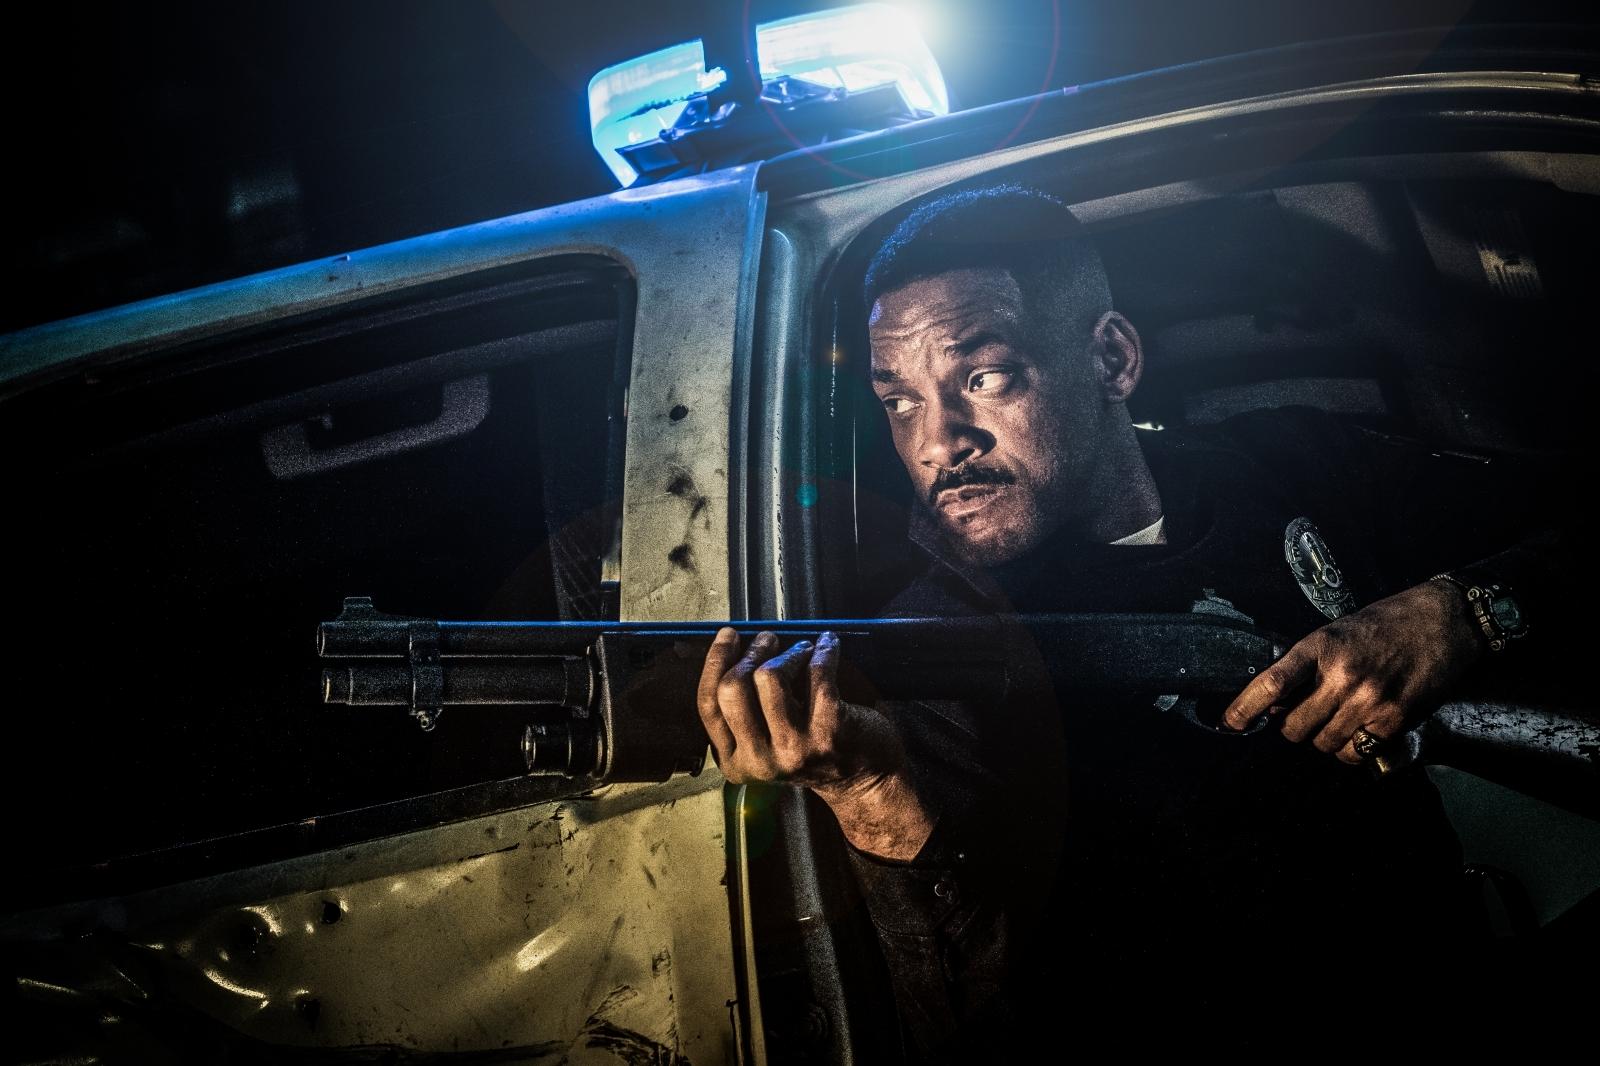 Netflixオリジナル映画『ブライト』 12月22日全世界同時オンラインストリーミング